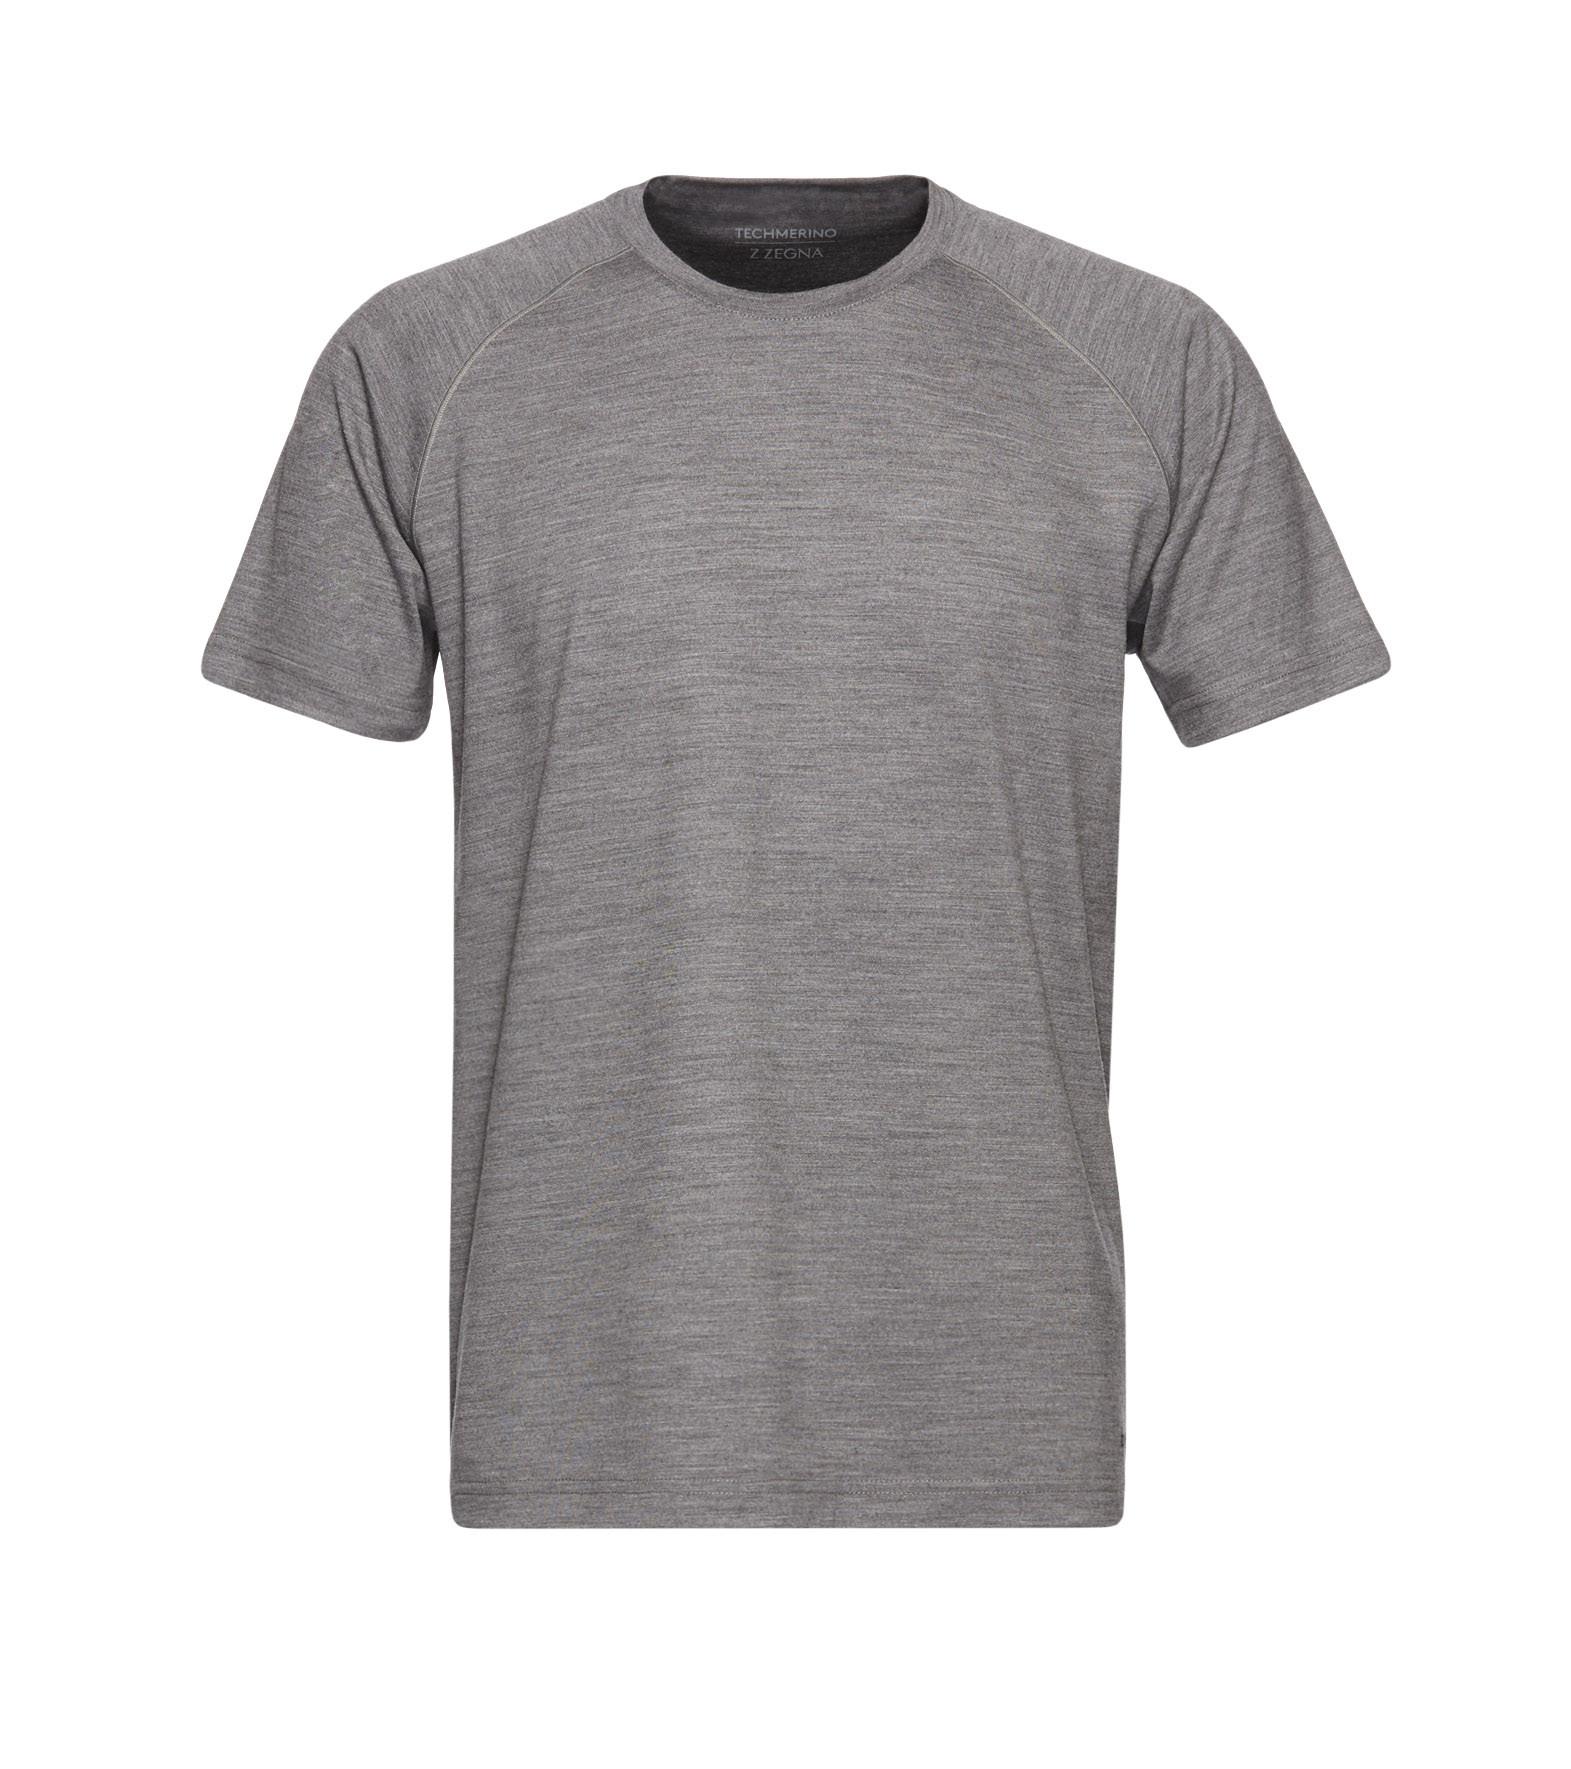 ermenegildo zegna gray techmerino t shirt for men lyst. Black Bedroom Furniture Sets. Home Design Ideas